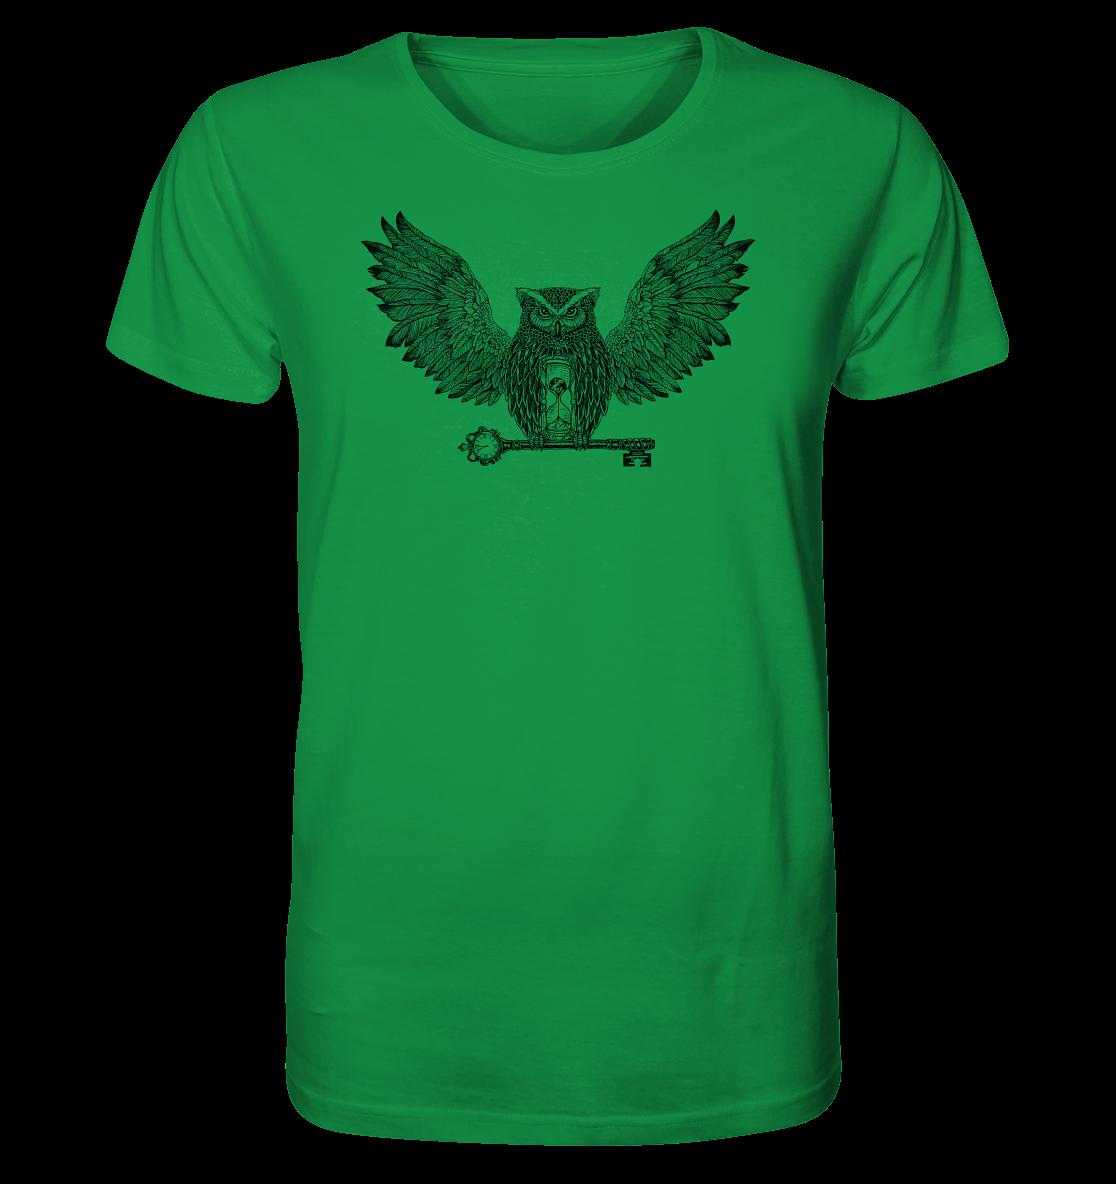 front-organic-shirt-149348-1116x-10.png